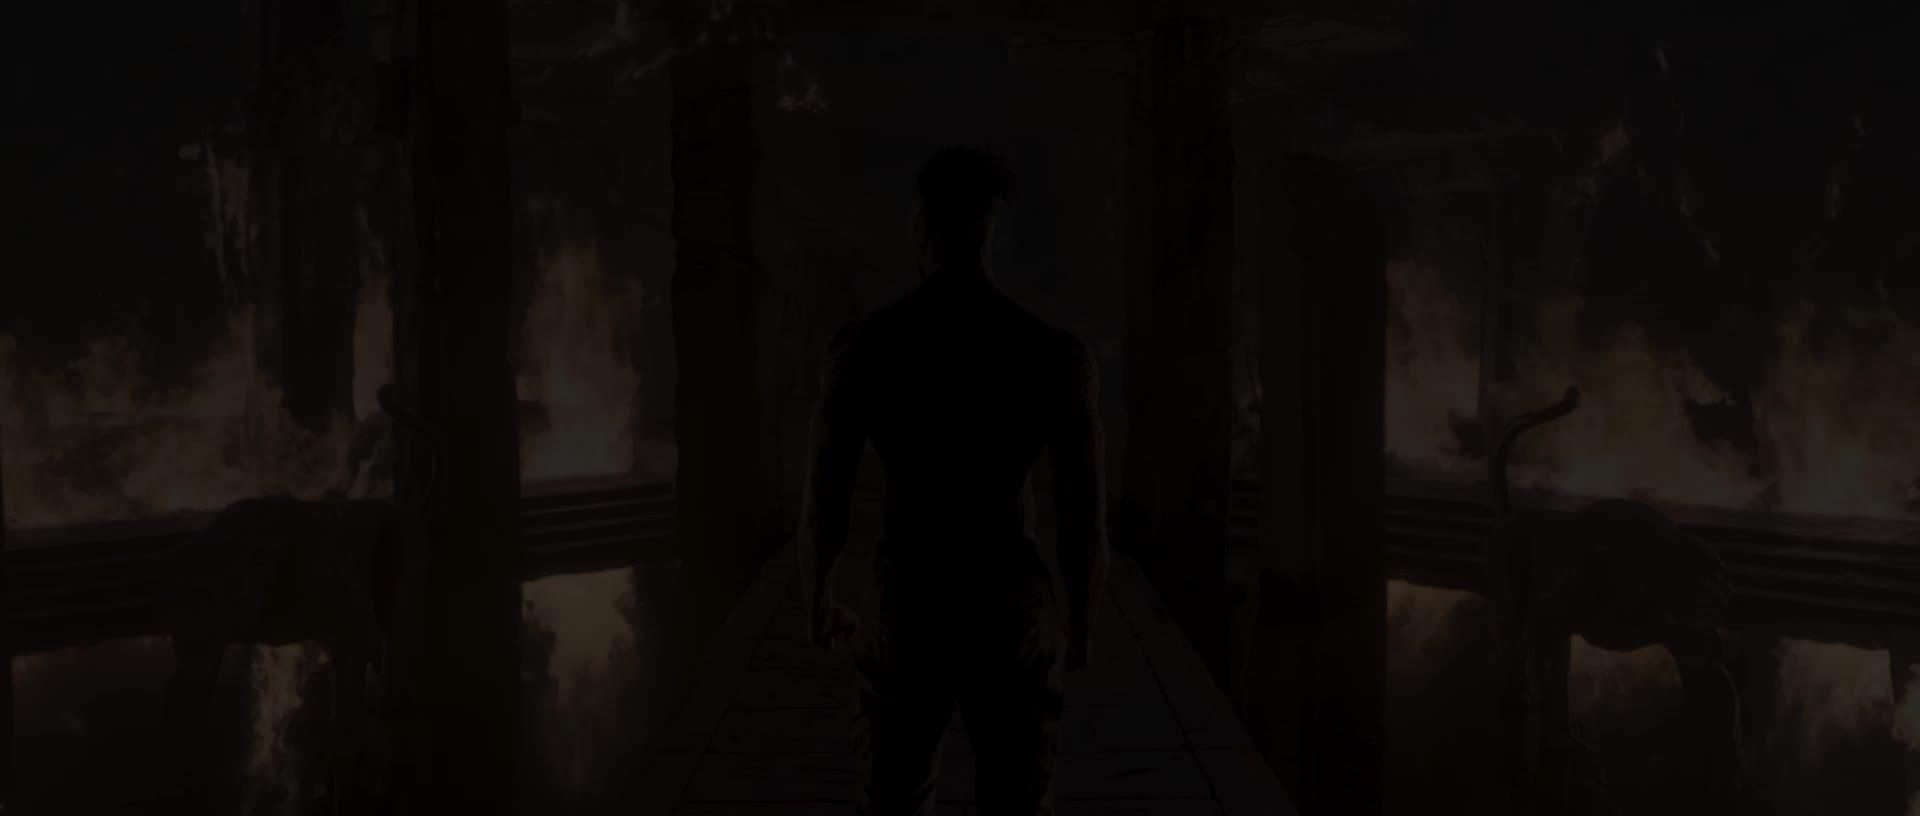 black panther, marvel, mcu, movie, new, Killmonger GIFs